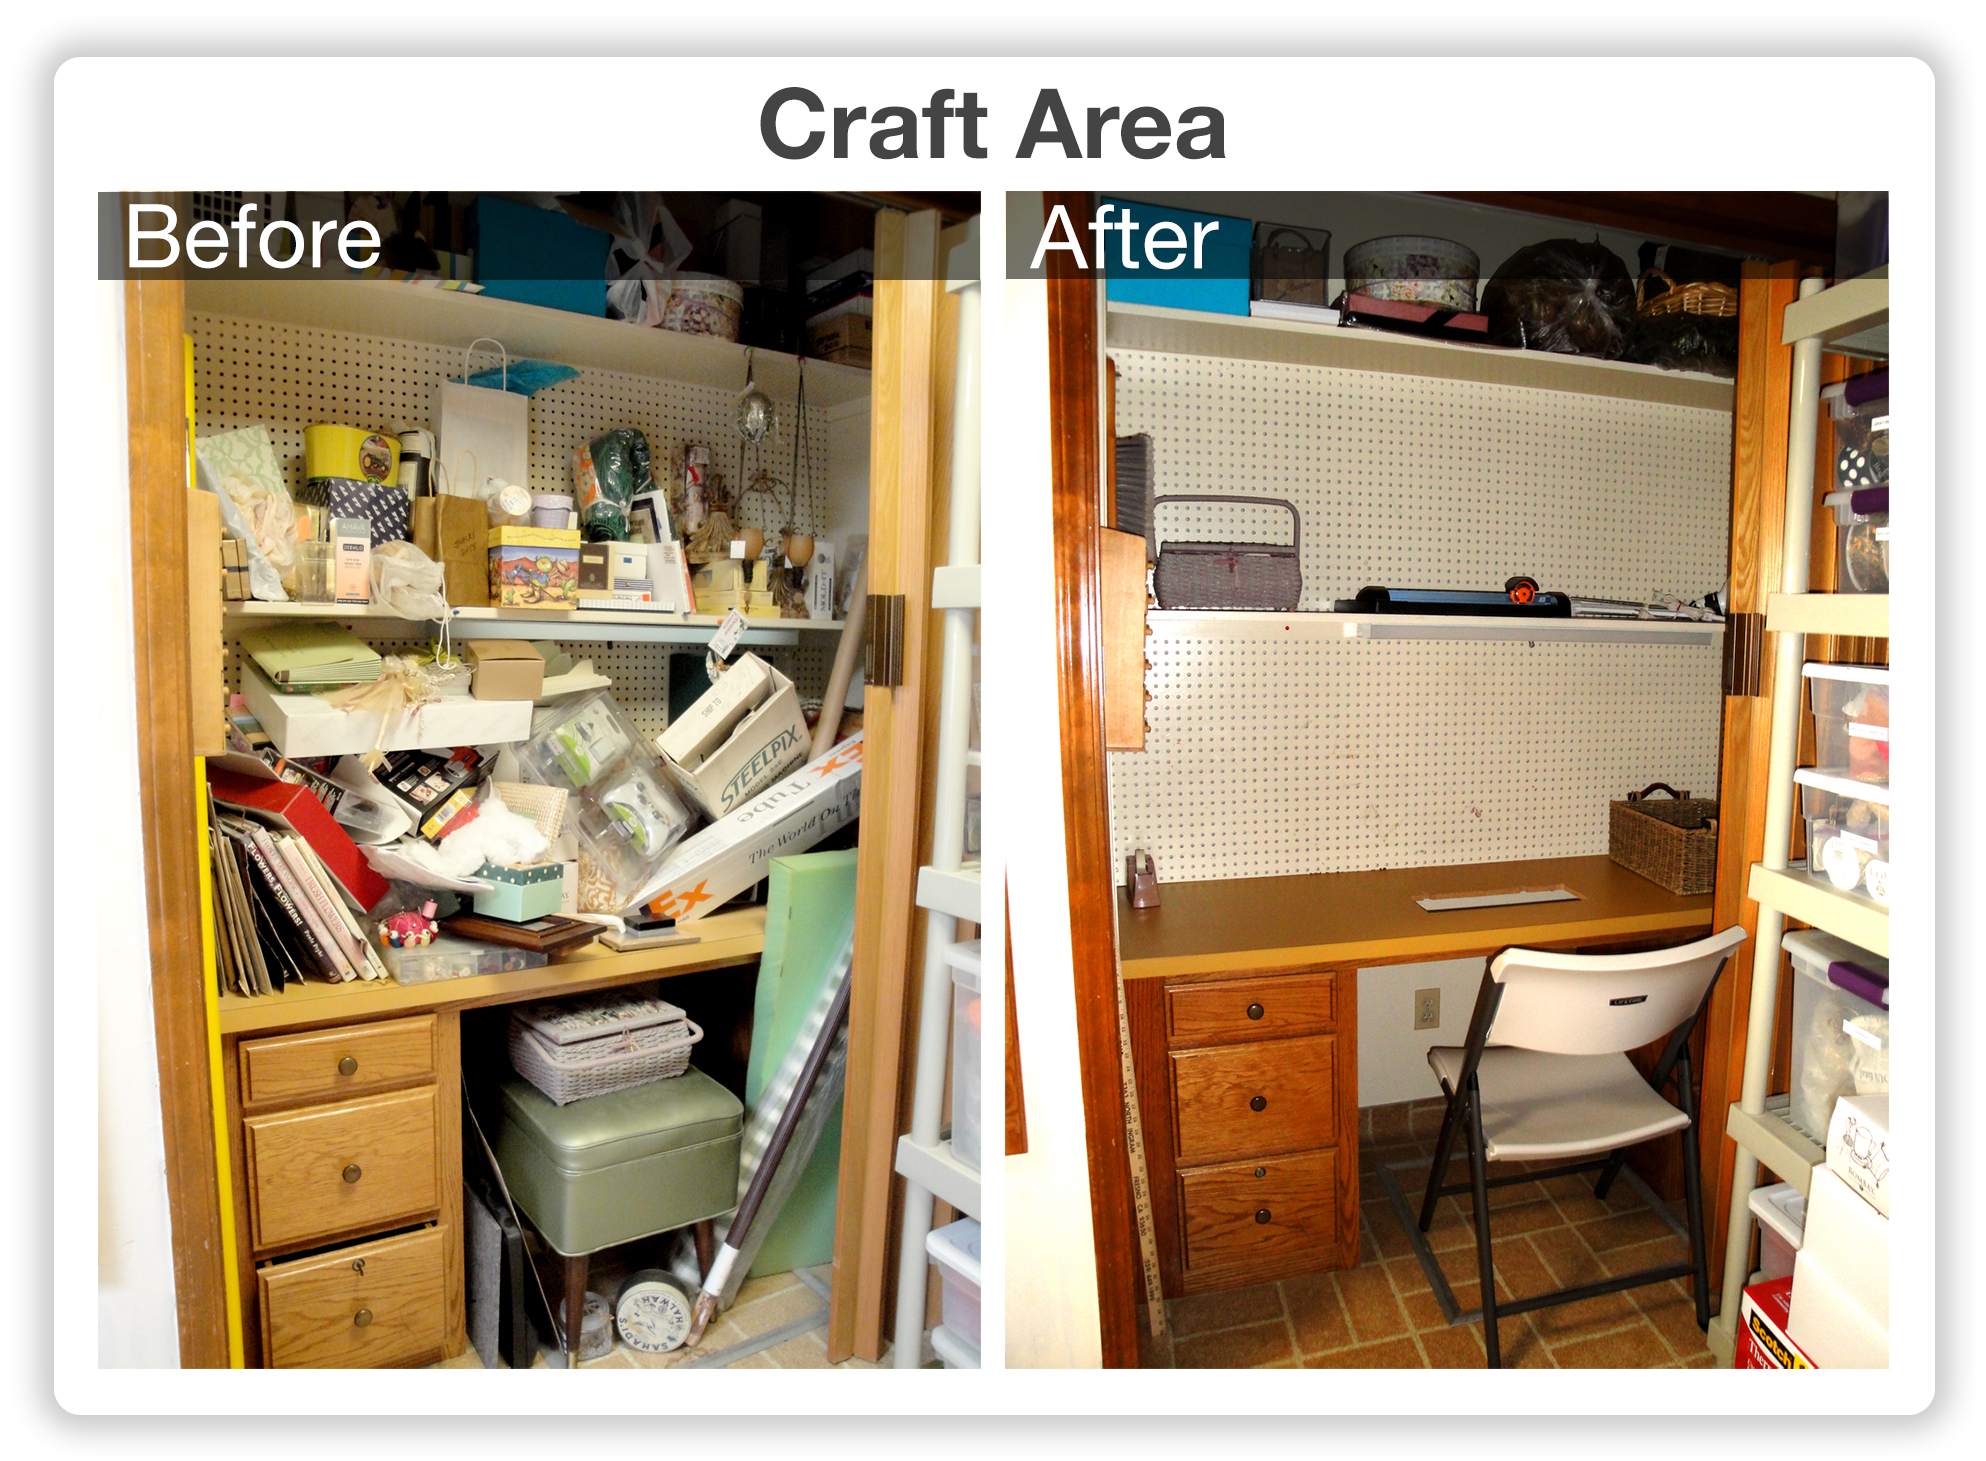 organized_by_choice_craft_area.jpg